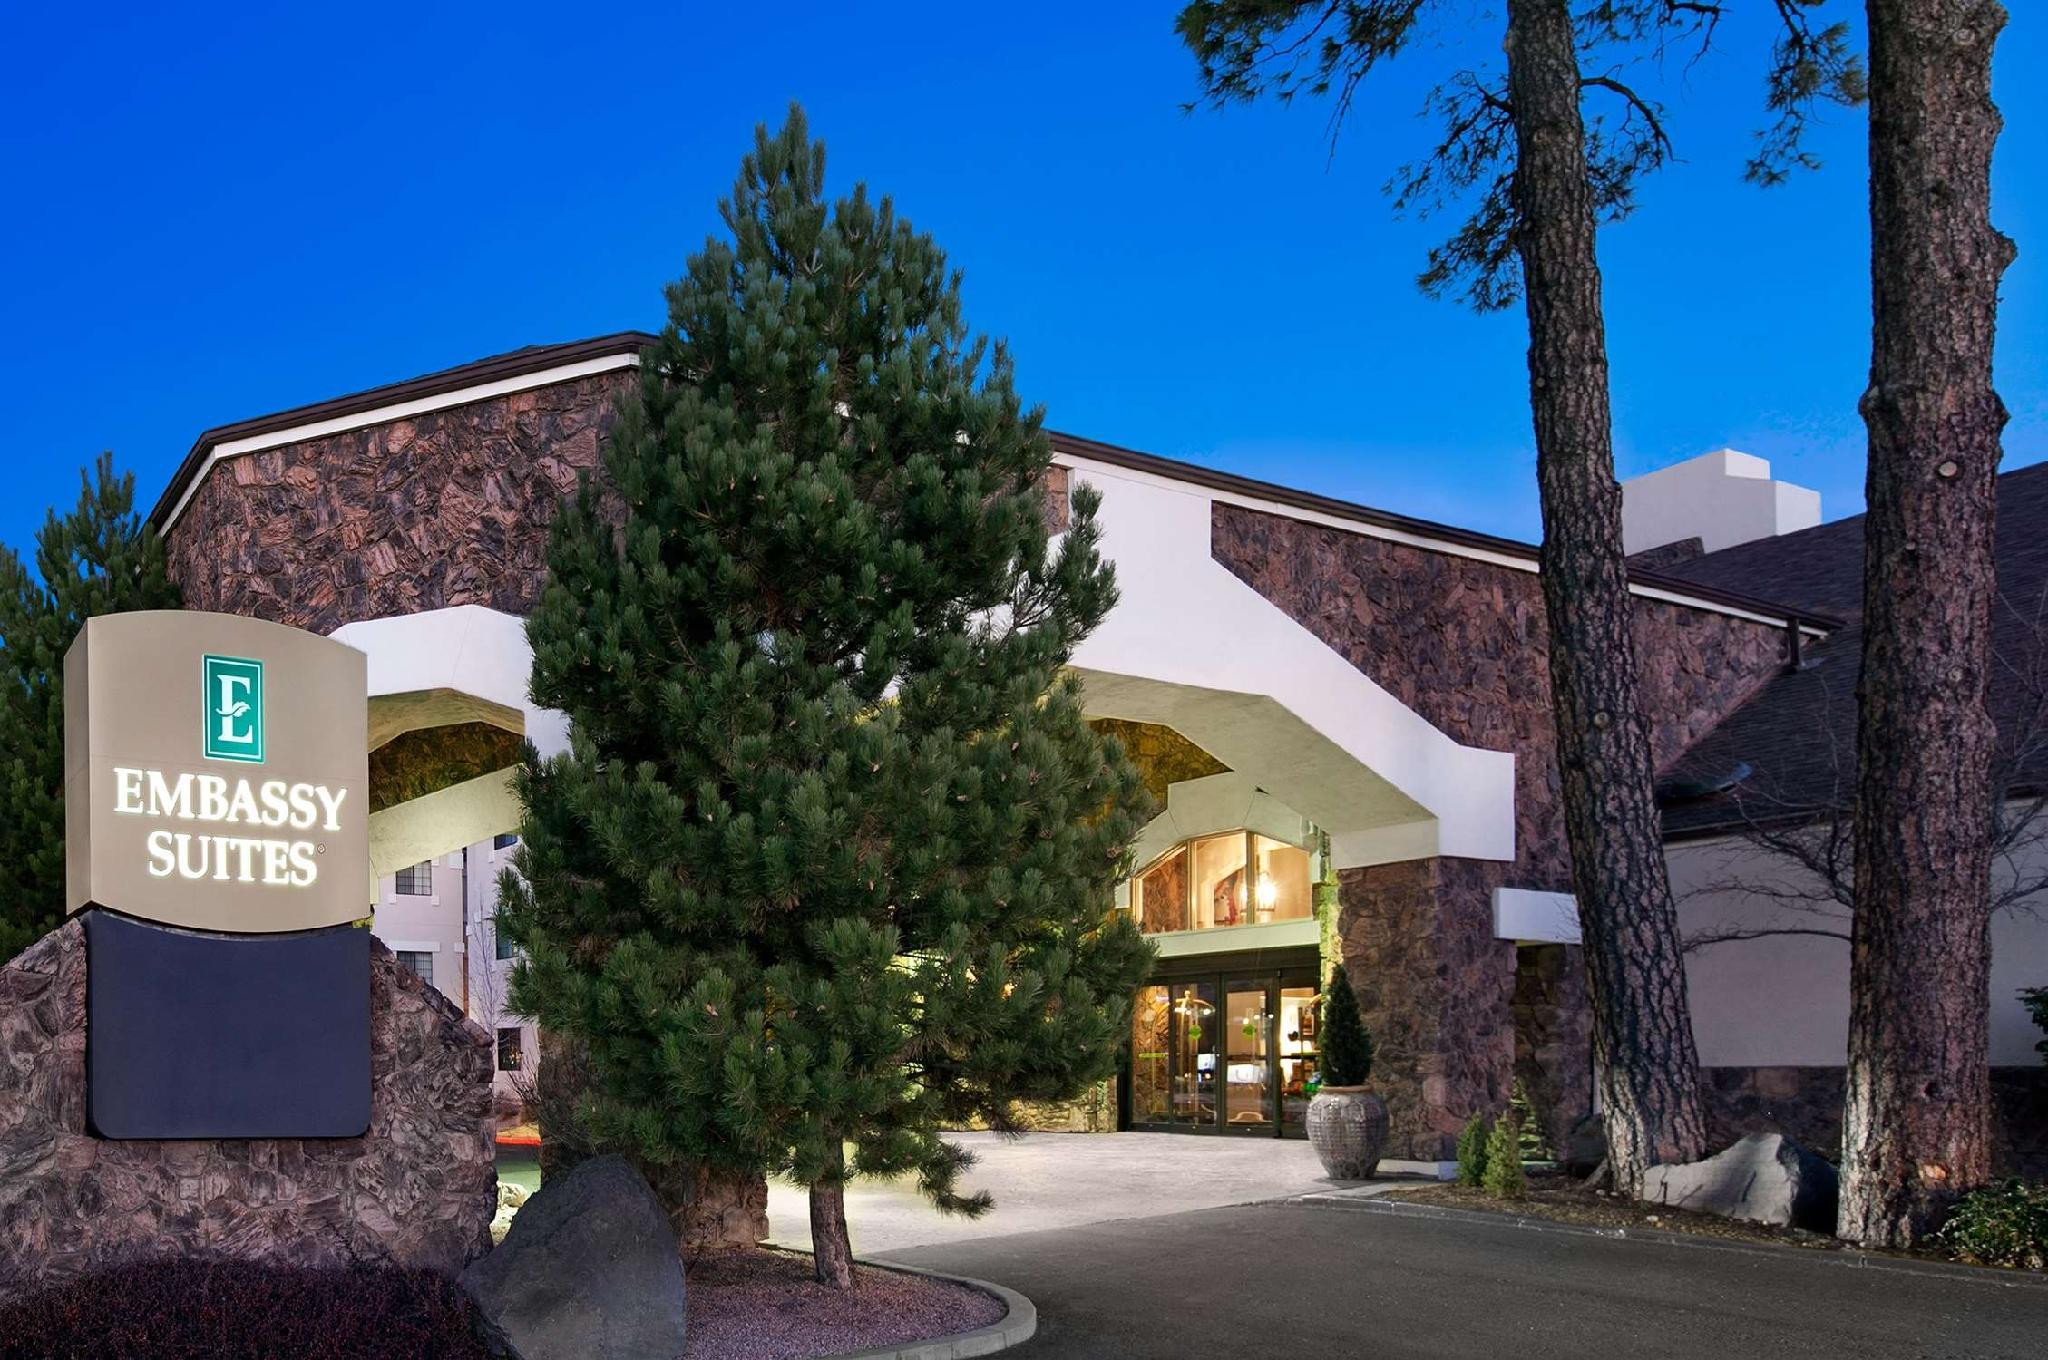 Embassy Suites Hotel Flagstaff Flagstaff (AZ) United States